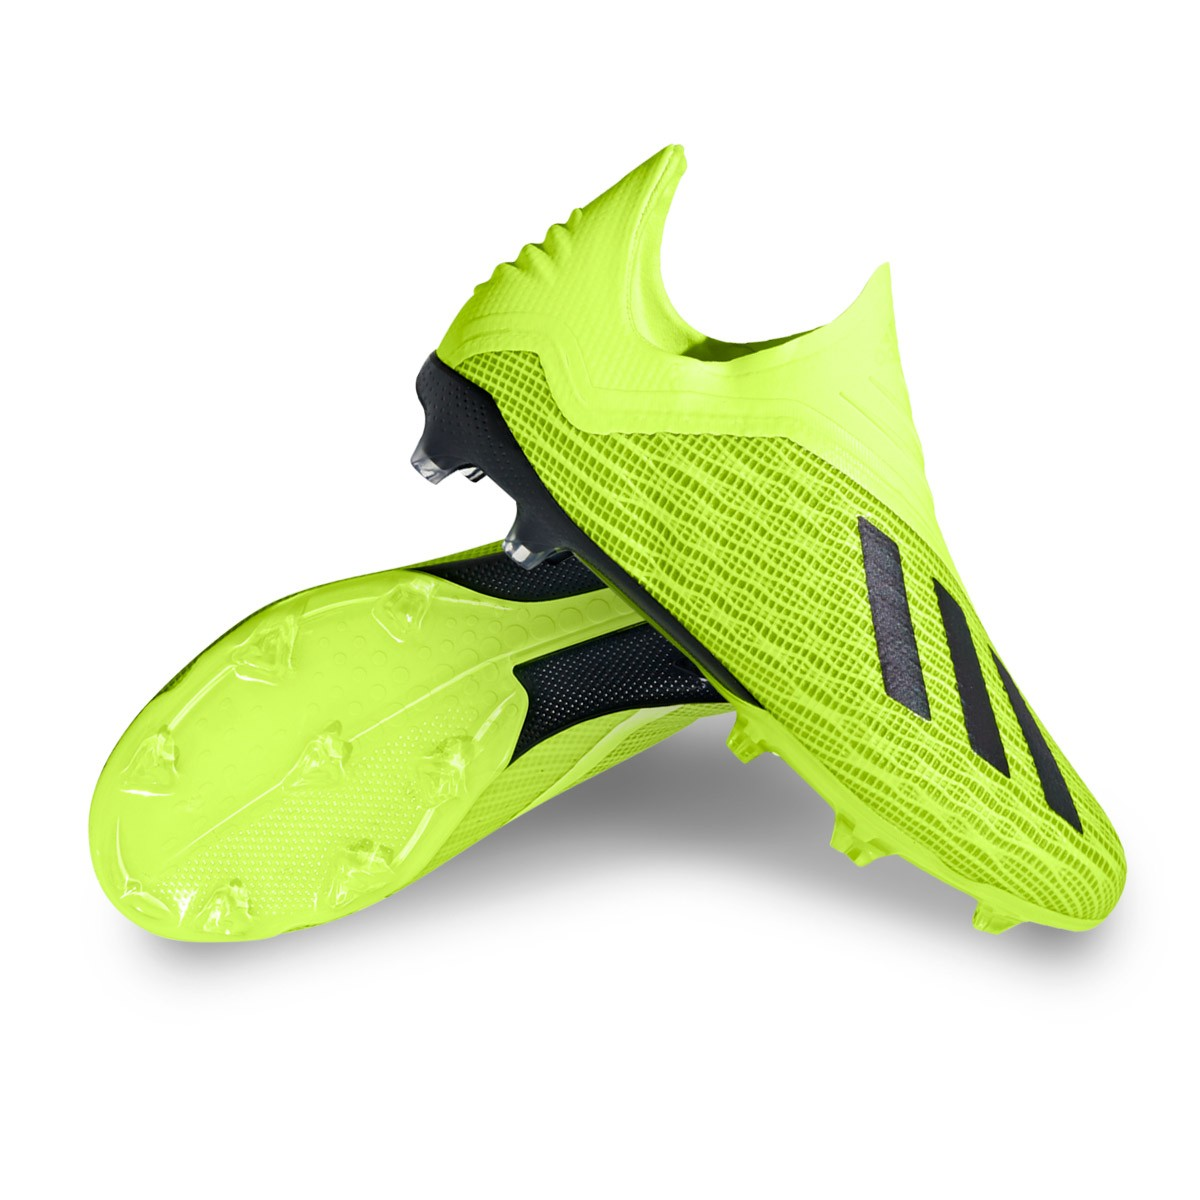 d8f433e52b7f9 Bota de fútbol adidas X 18+ FG Niño Solar yellow-Core black-White - Tienda  de fútbol Fútbol Emotion